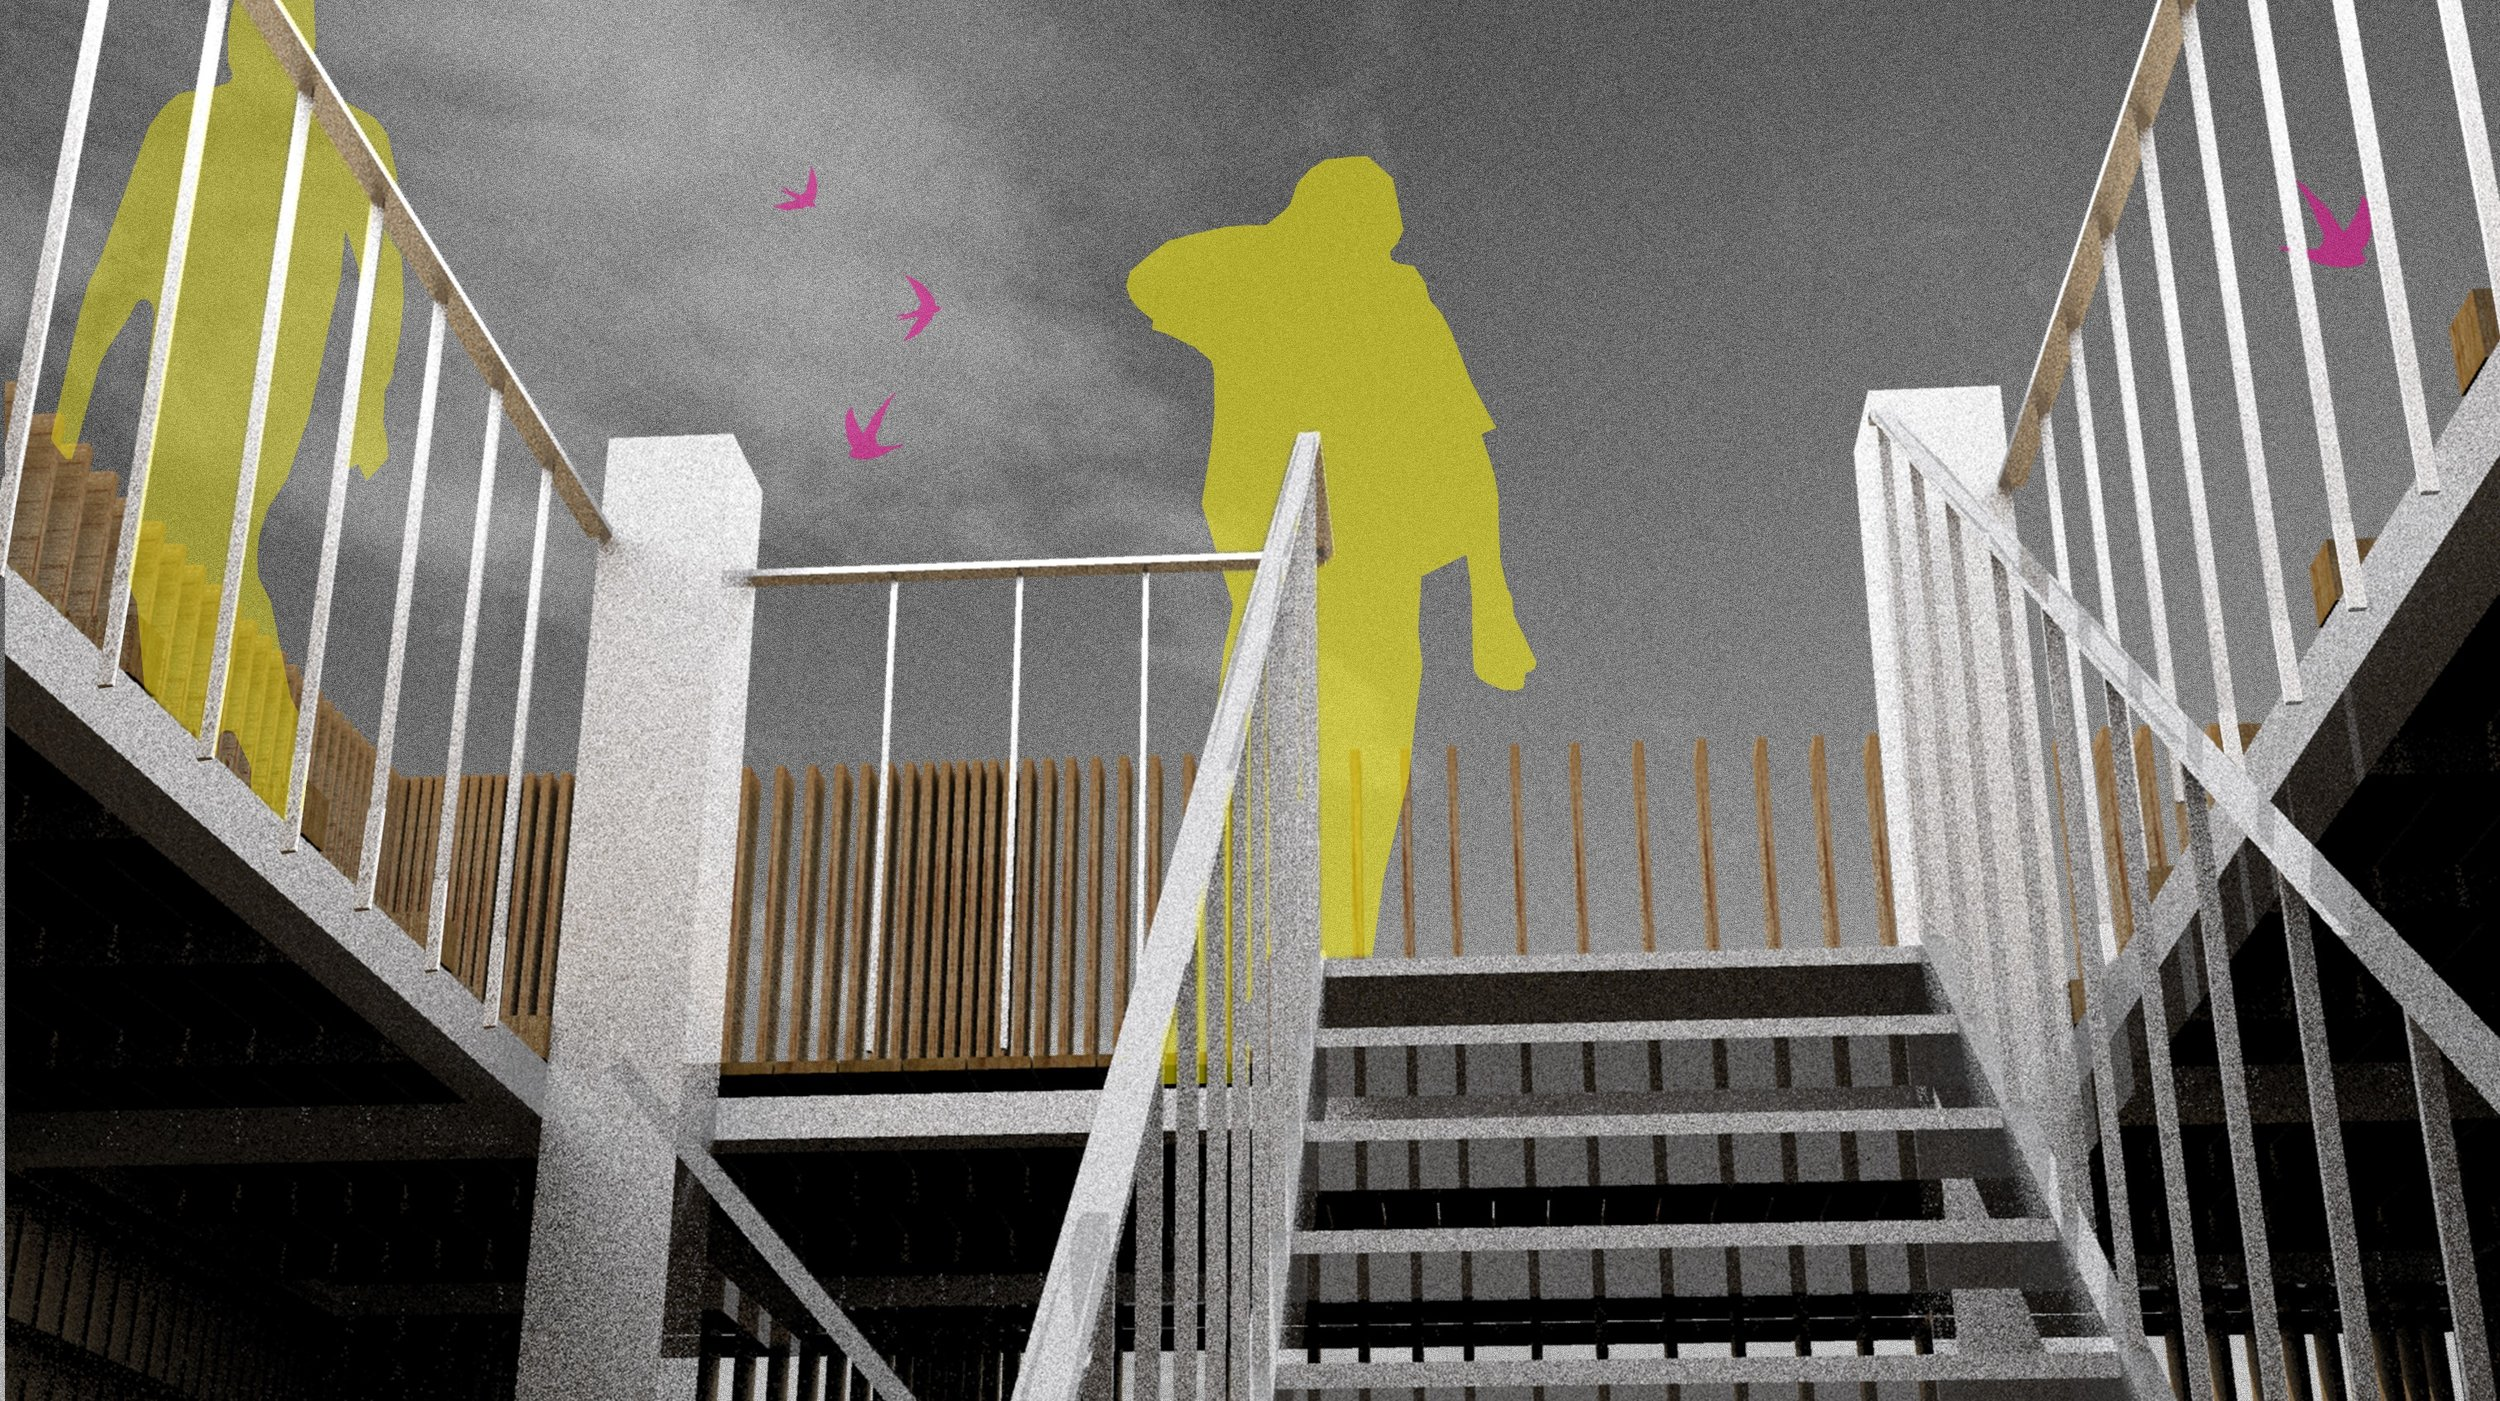 Felix Wilson - Felix-Wilson-TheArchiologist-Tower_III-7-View-From-Stairs.jpg